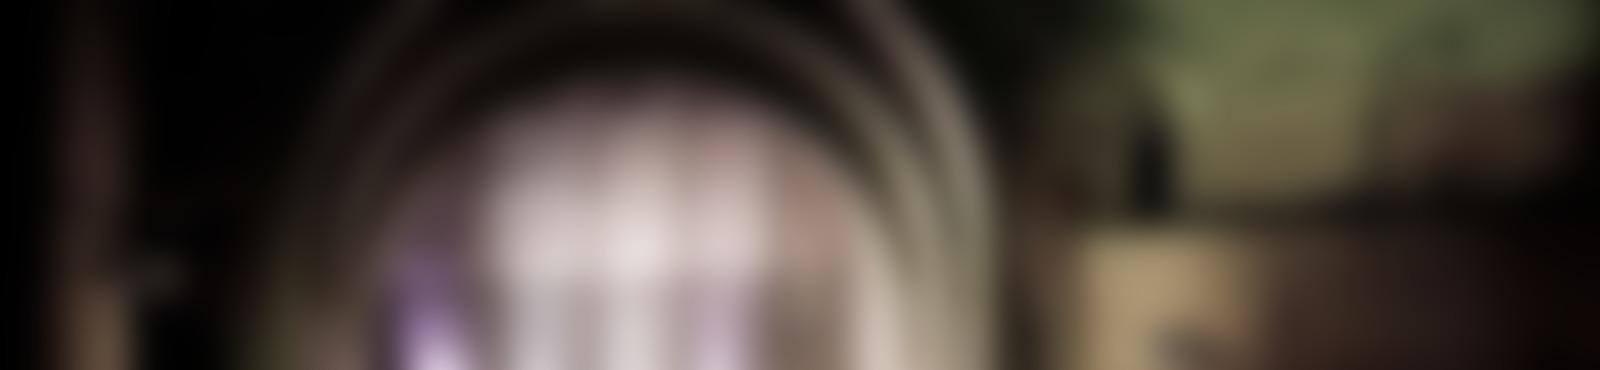 Blurred delphi 01 saal  leer  askhelmut